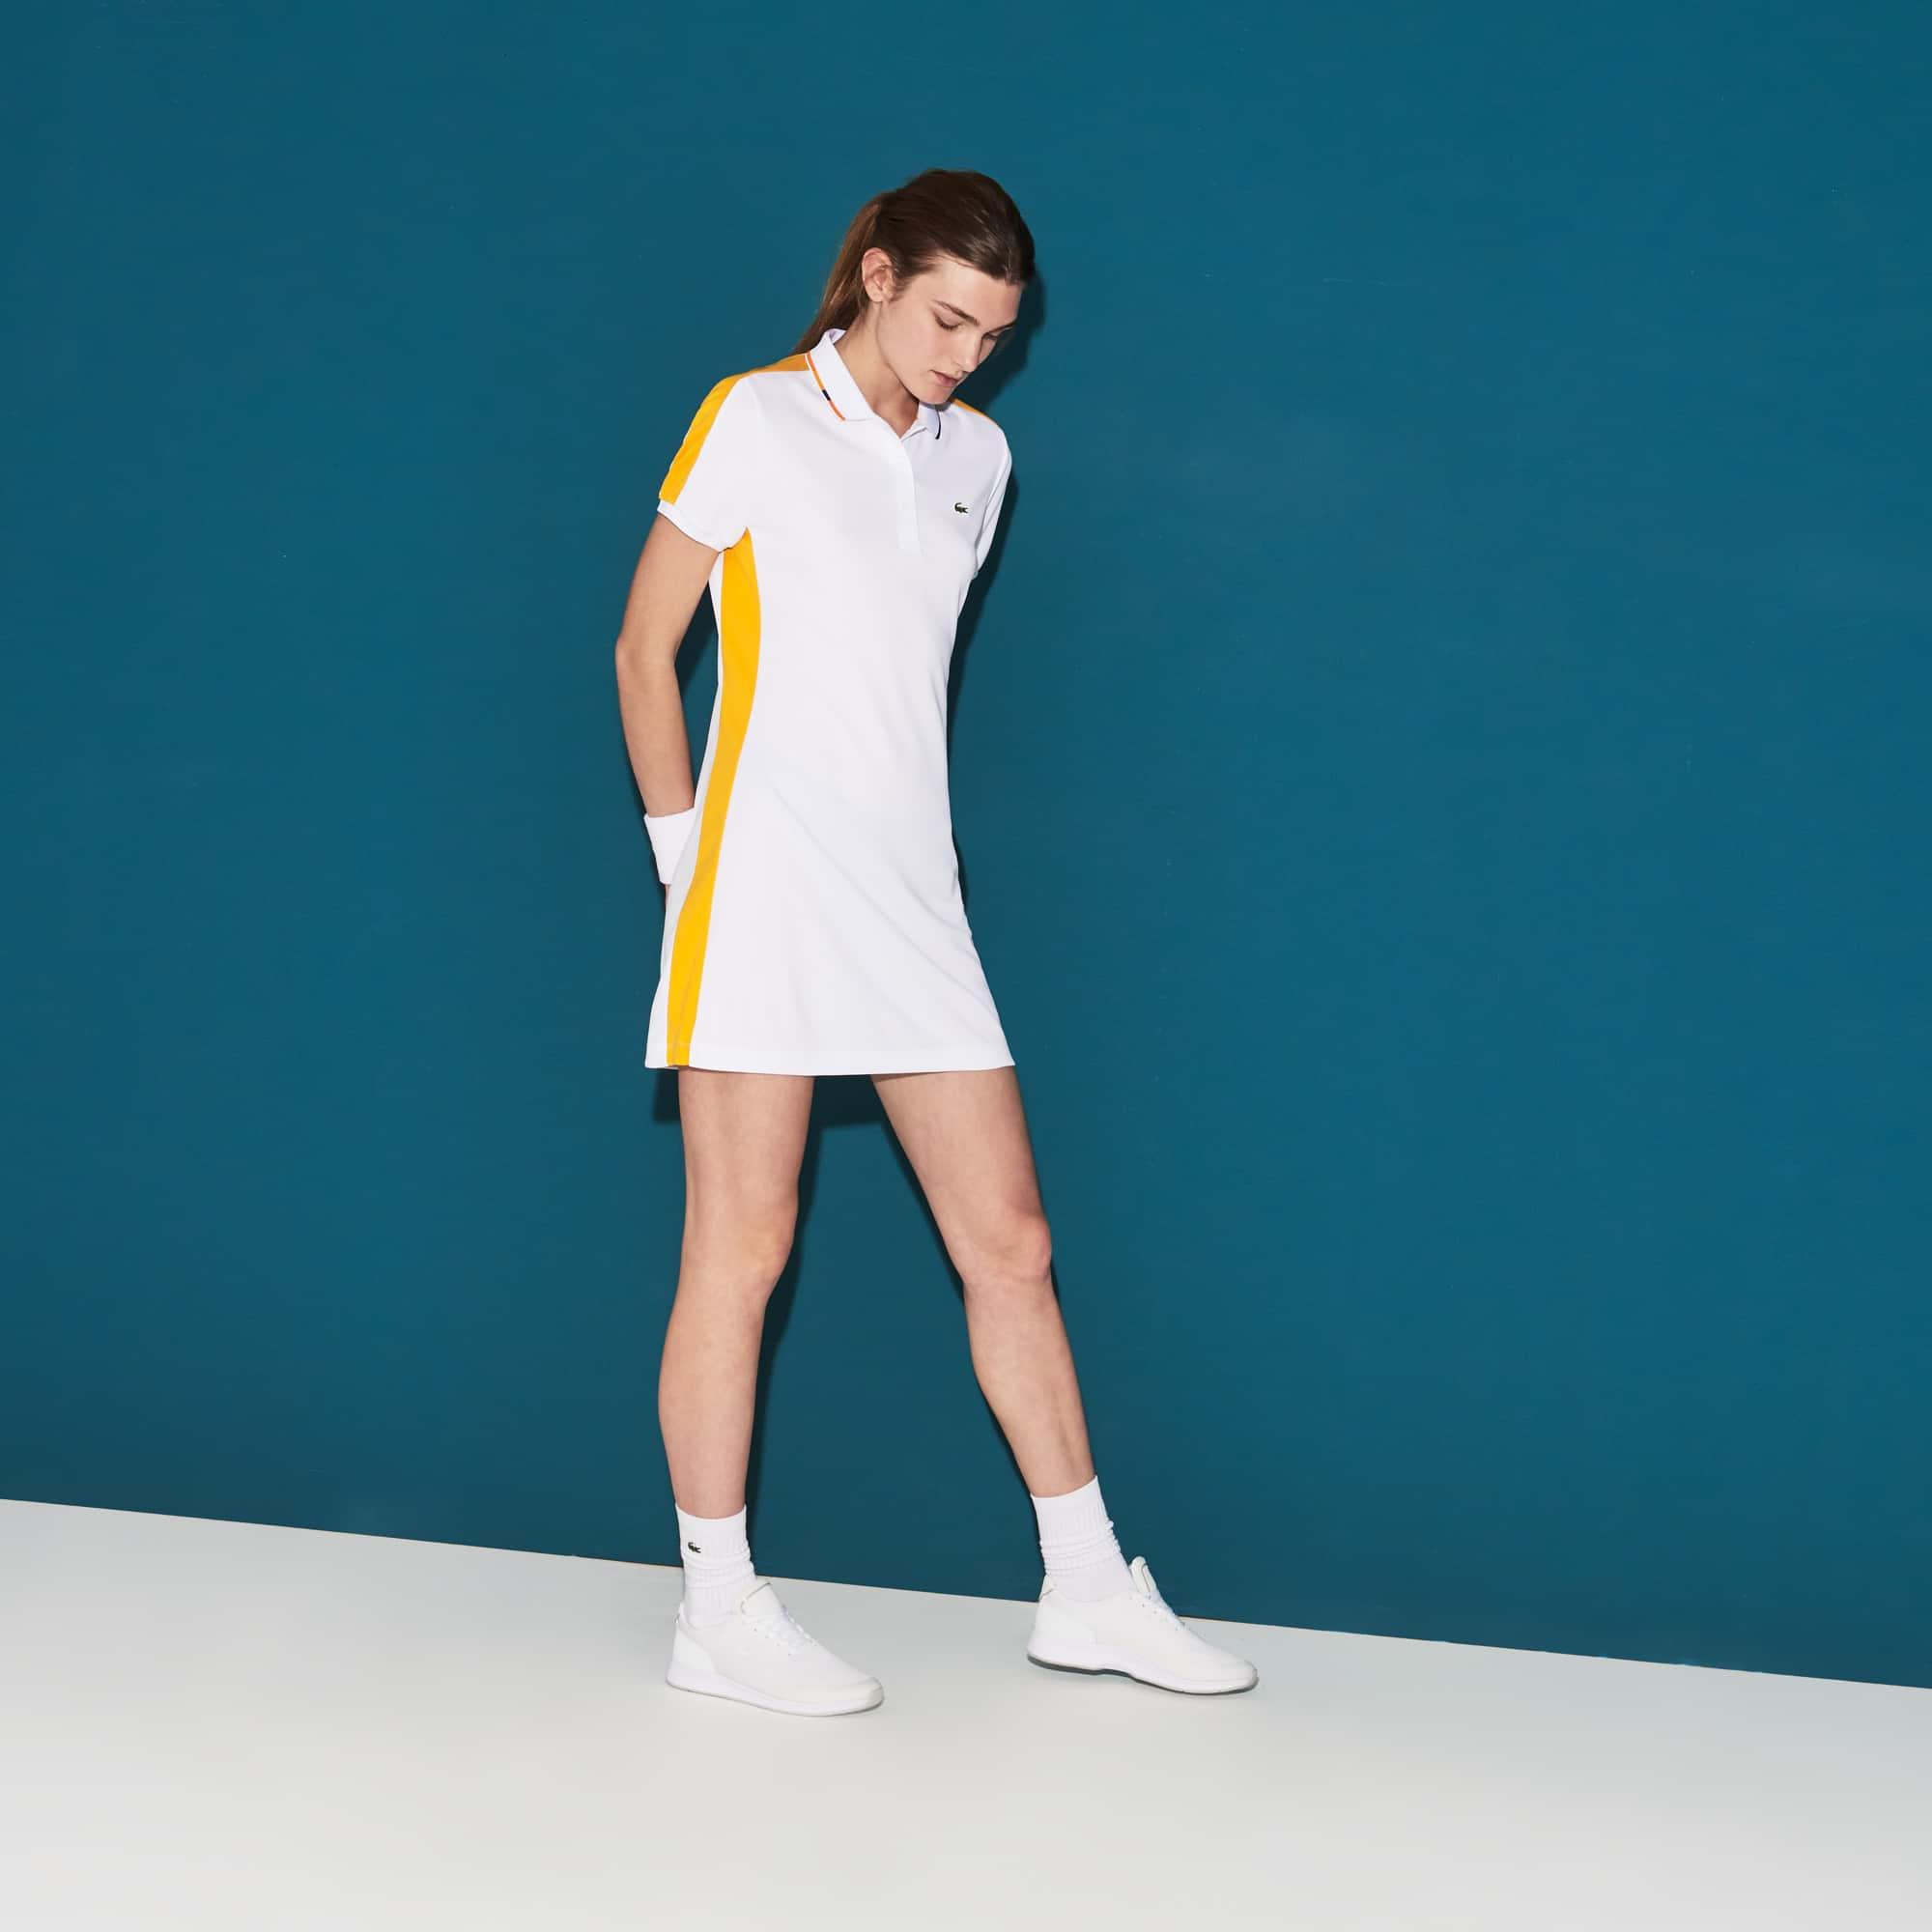 Lacoste SPORT Tennis-polojurk dames technisch piqué met contrasterende strepen